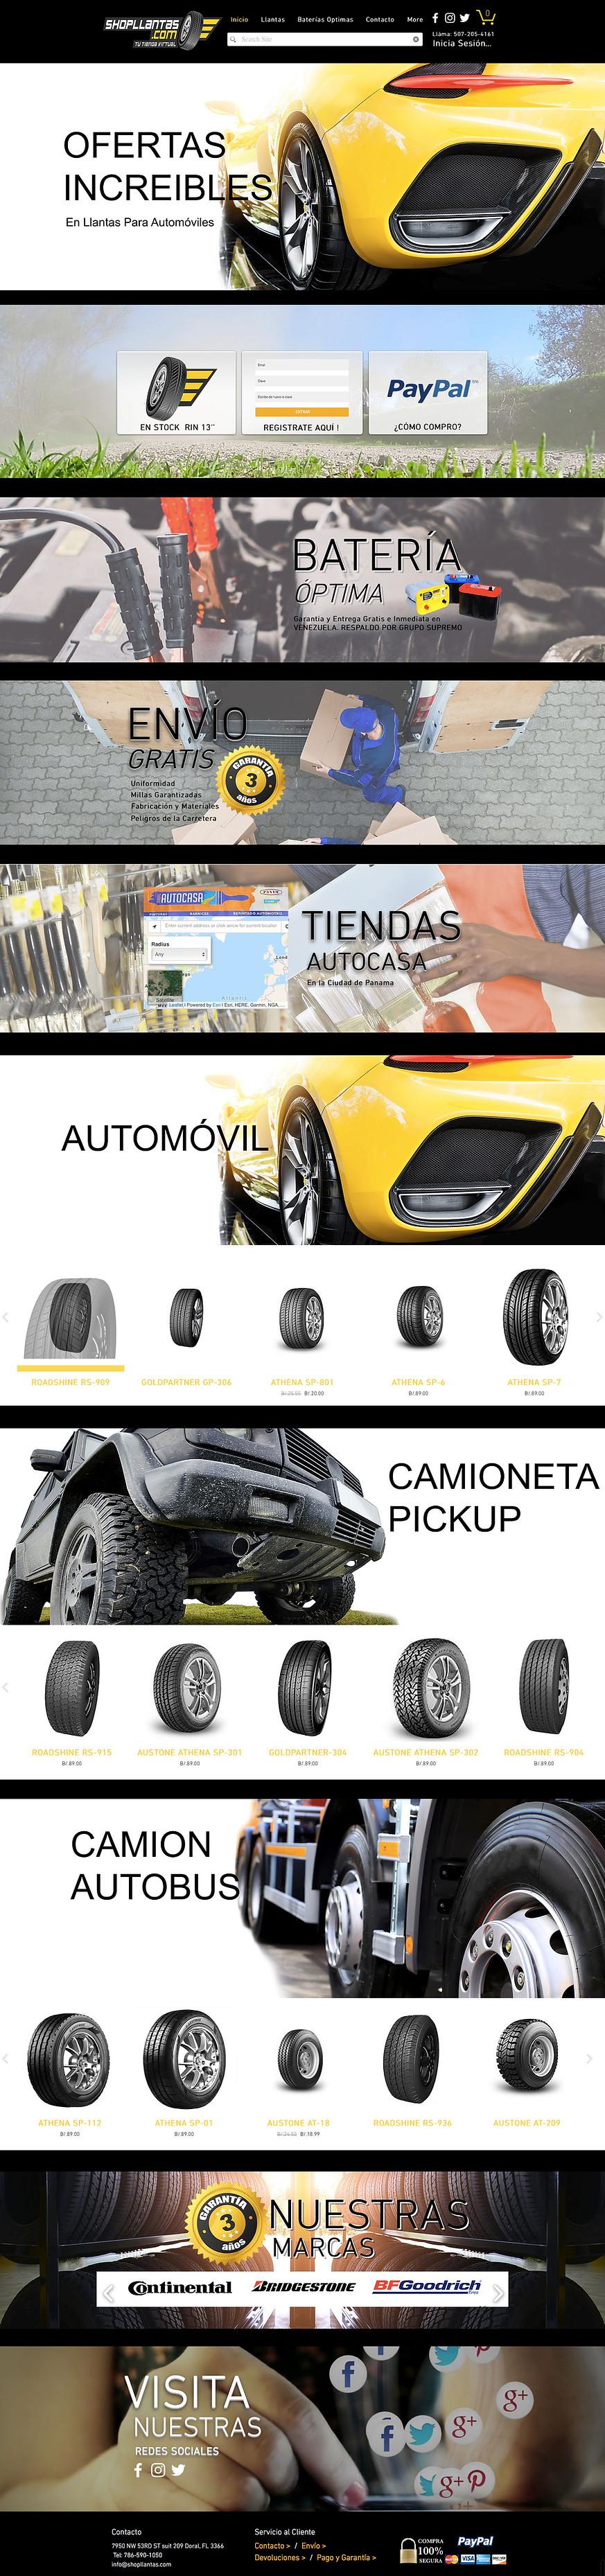 website-design-tire-shop-pembroke-pines.jpg